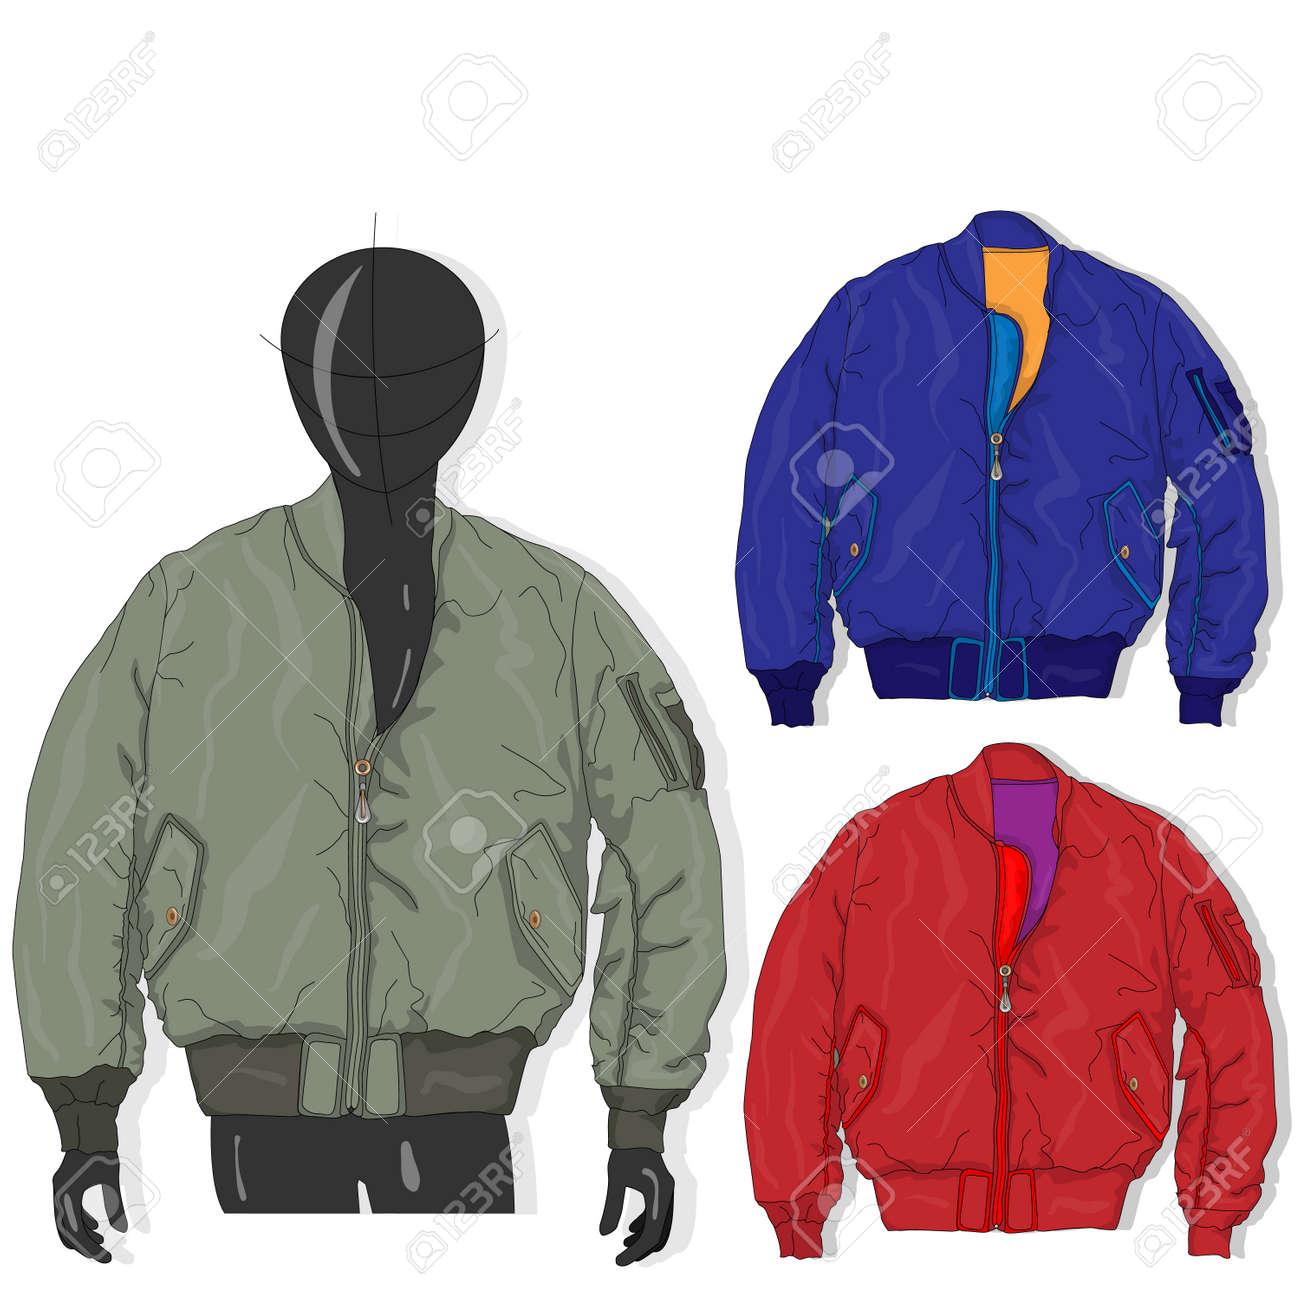 Pilot jacket. Bomber. Vector illustration. Men clothes collection. - 124529892